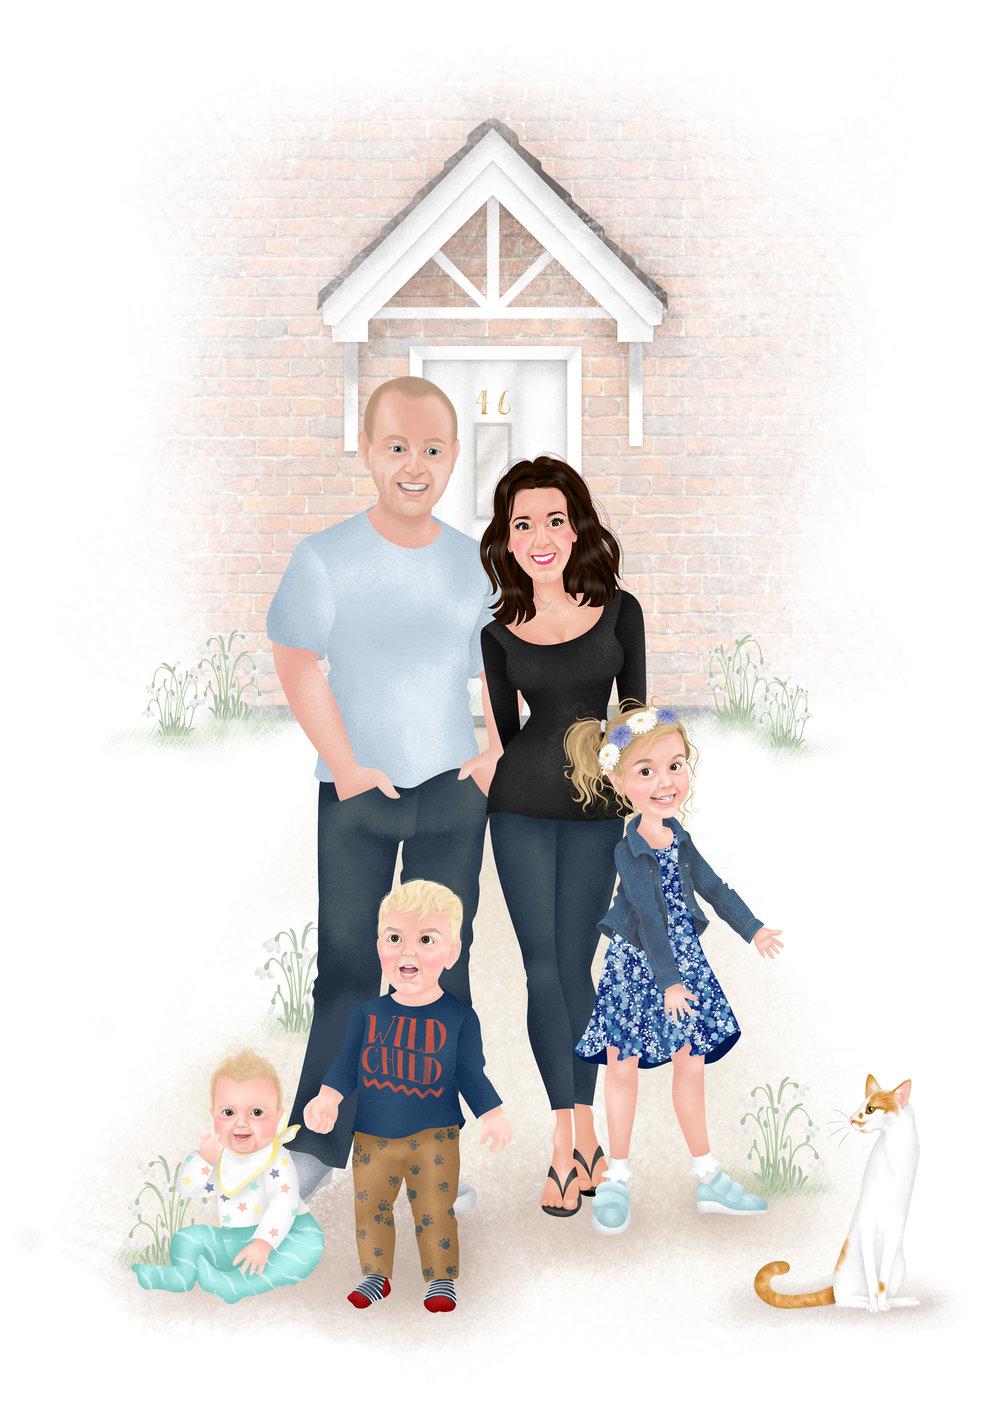 Hannah-Weeks - Family Portrait - Catherine Lambie - A4.jpg